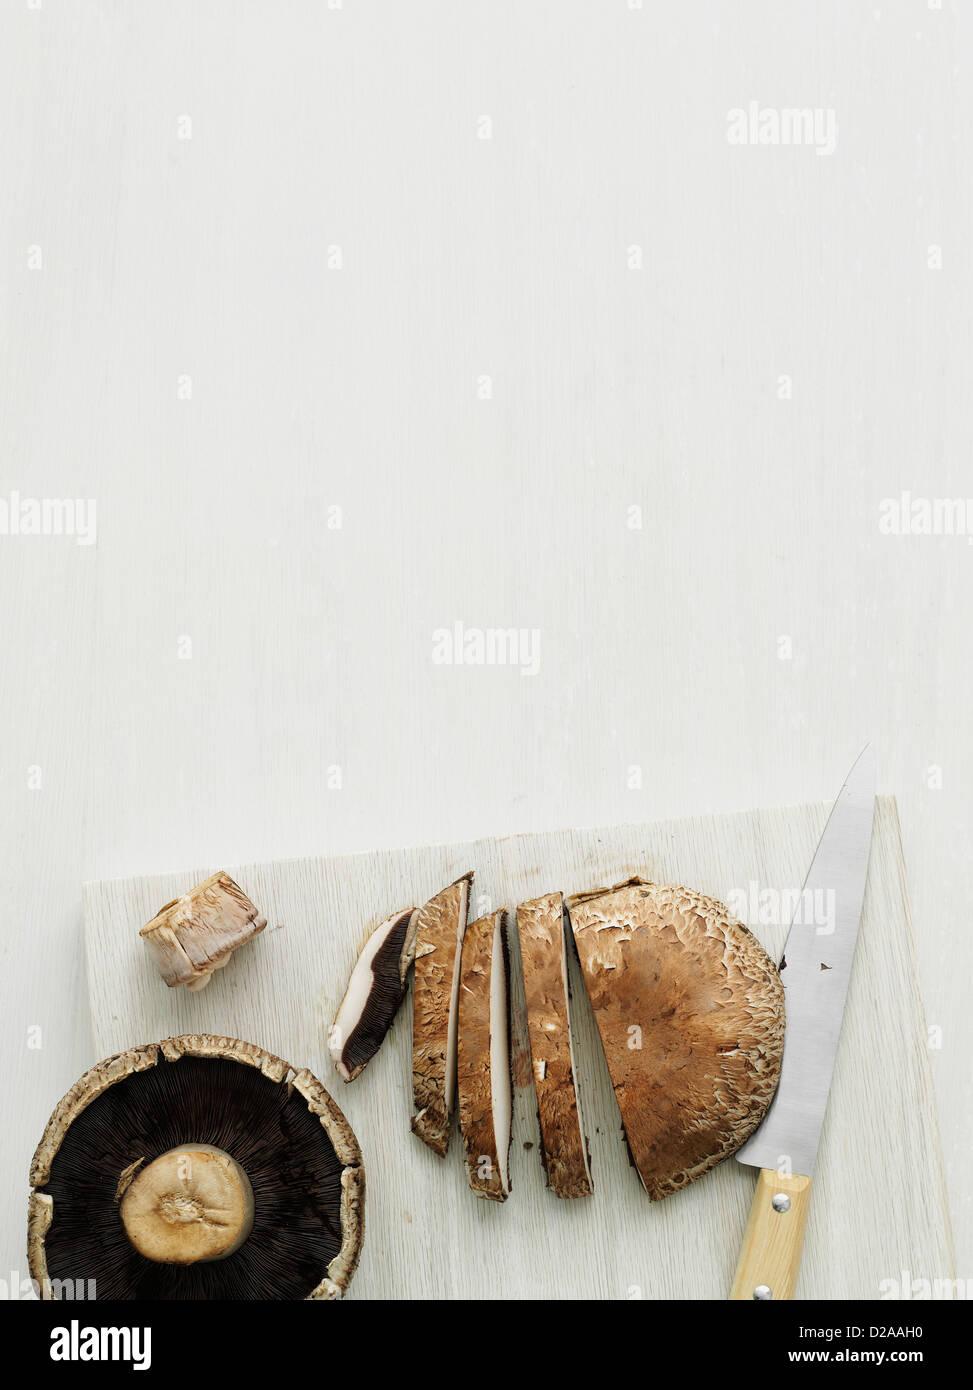 Mushroom on cutting board - Stock Image